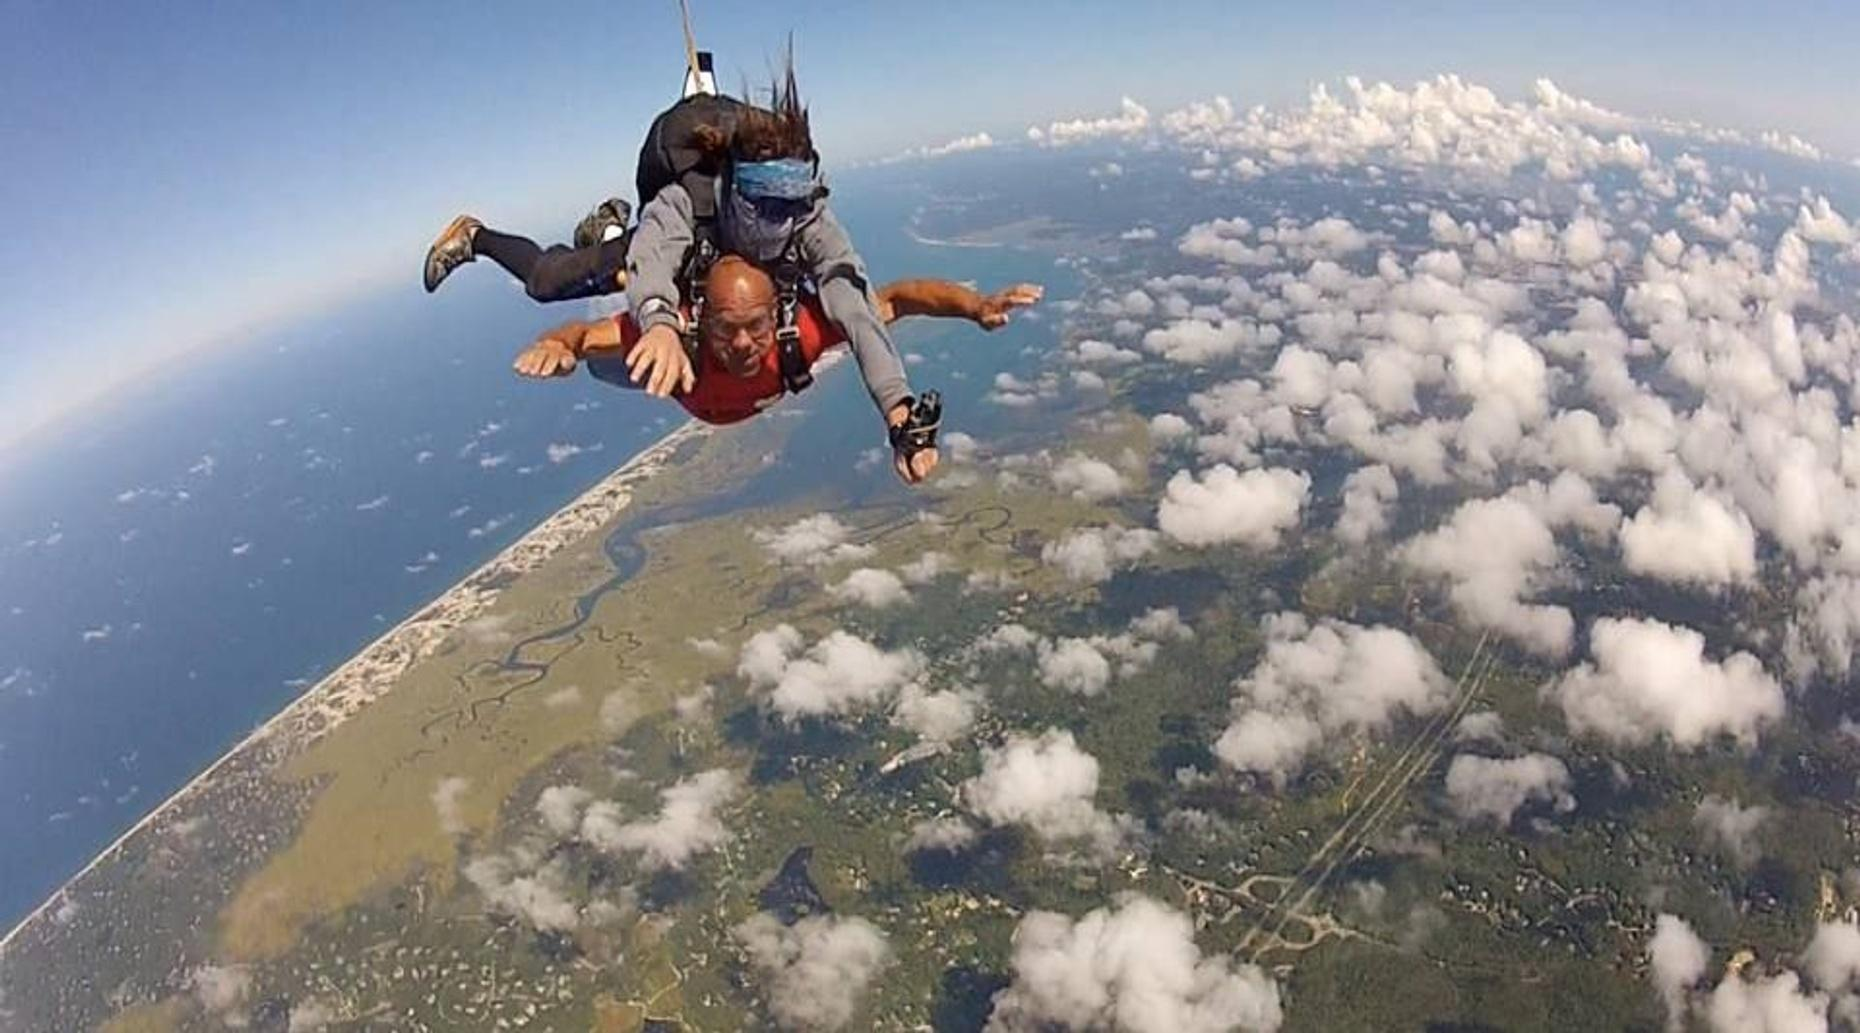 Marstons Mills Tandem Skydiving